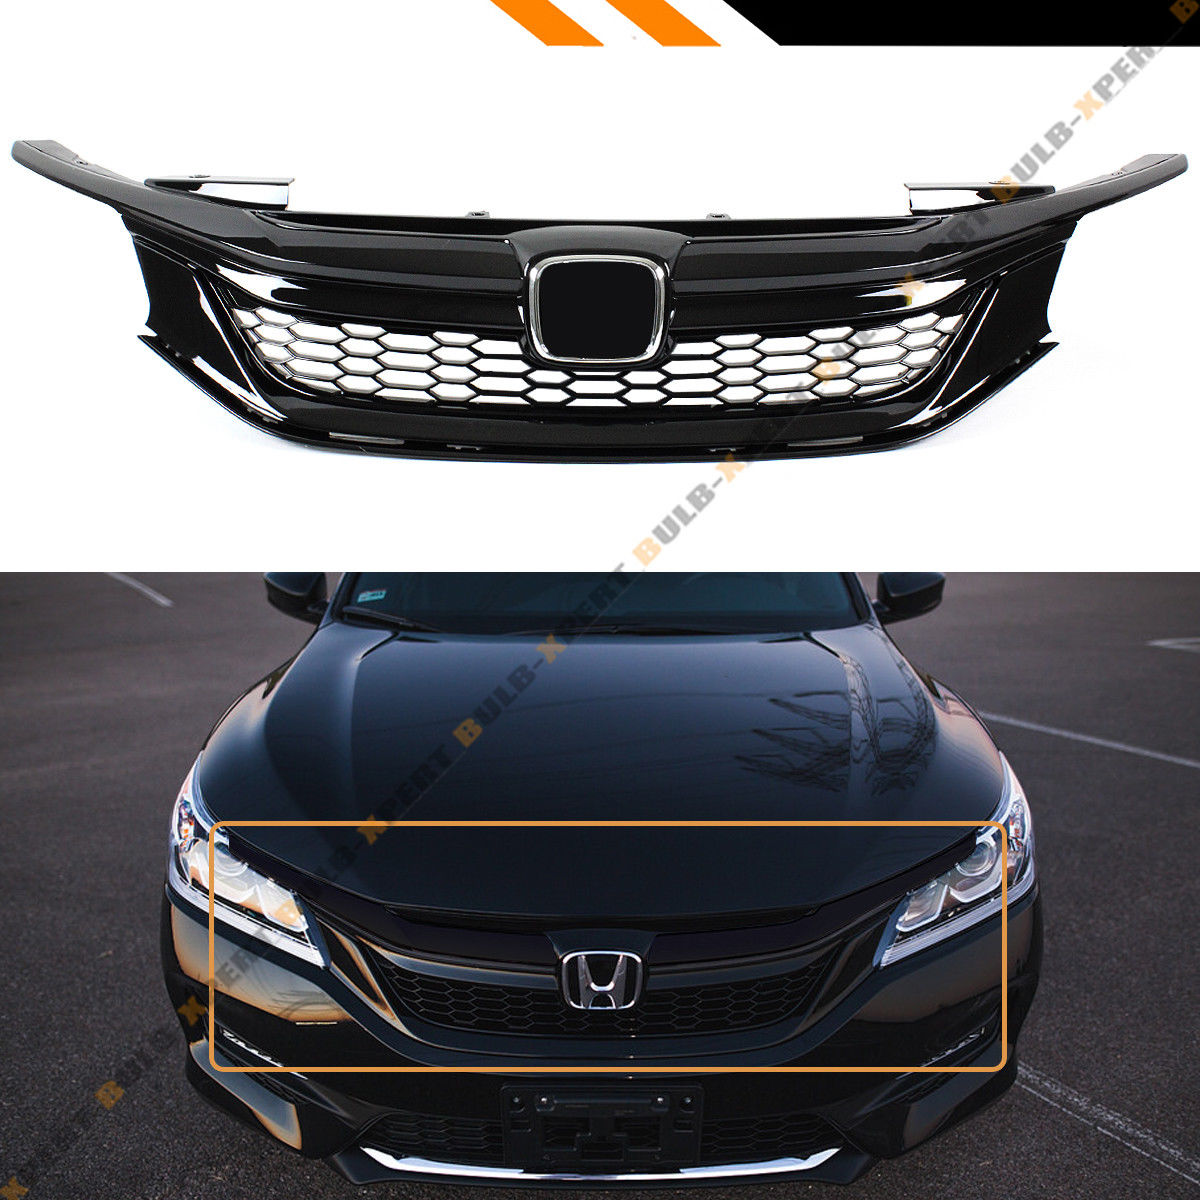 Amazing For 2016-17 9th Gen Honda Accord Sedan Gloss Black